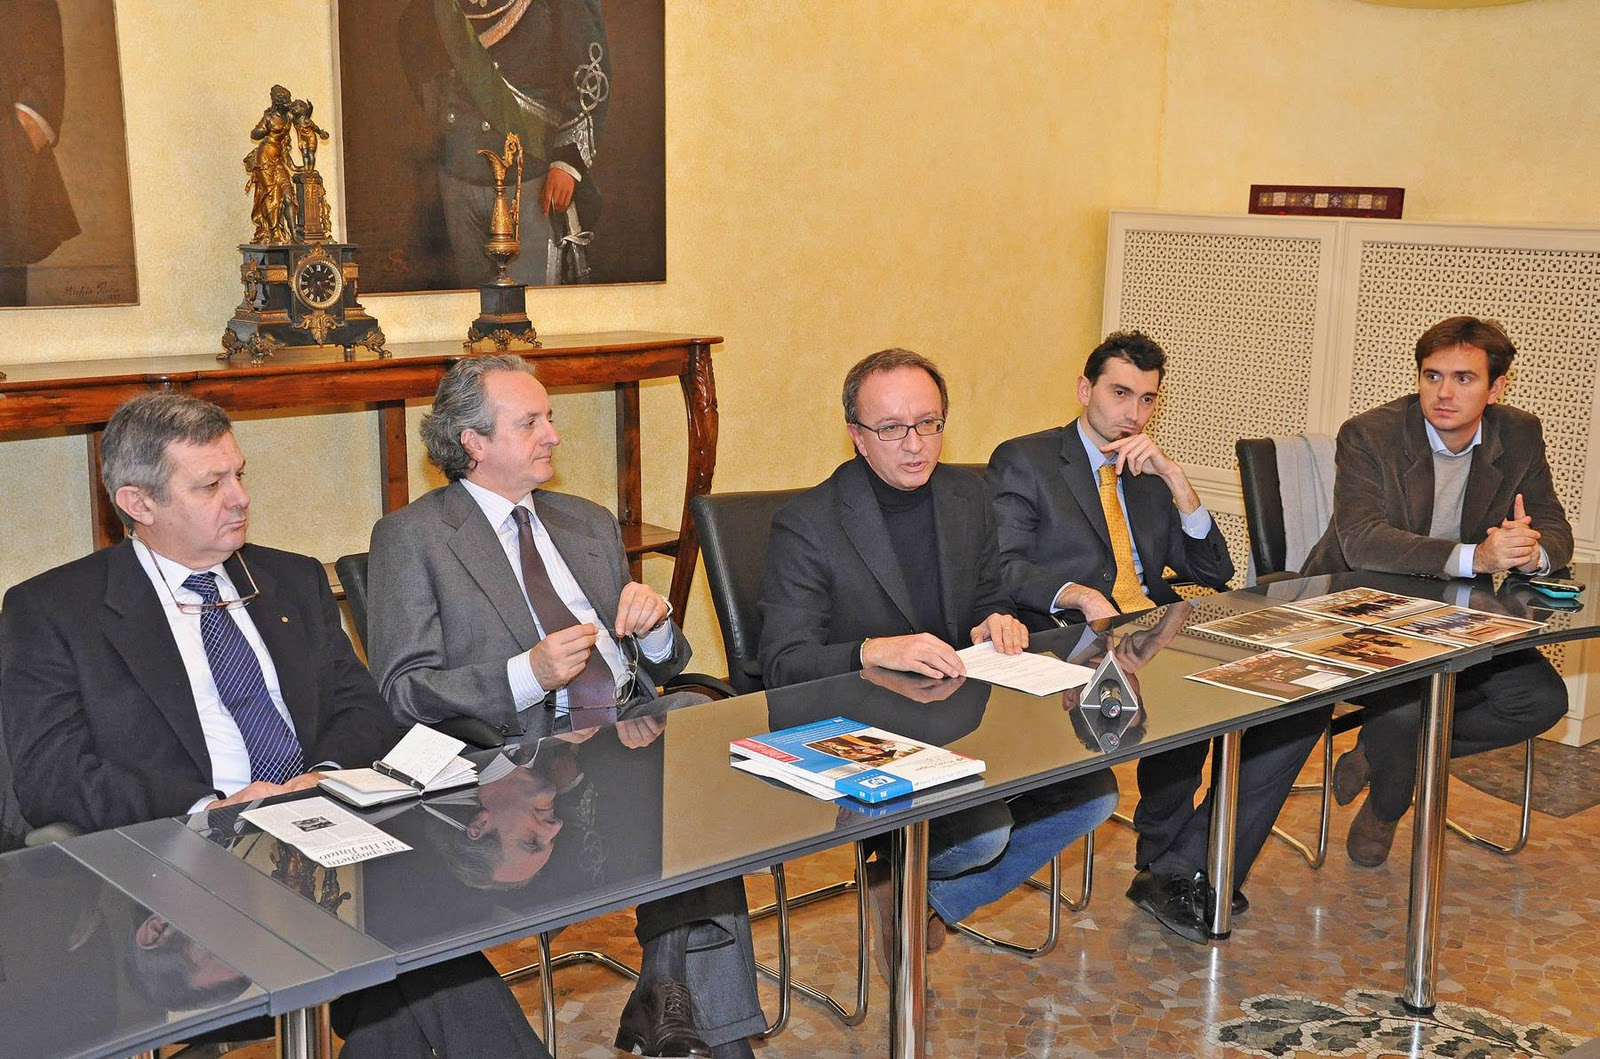 Pavia pavia ospiter una riunione del bureau - Bureau international des expositions ...